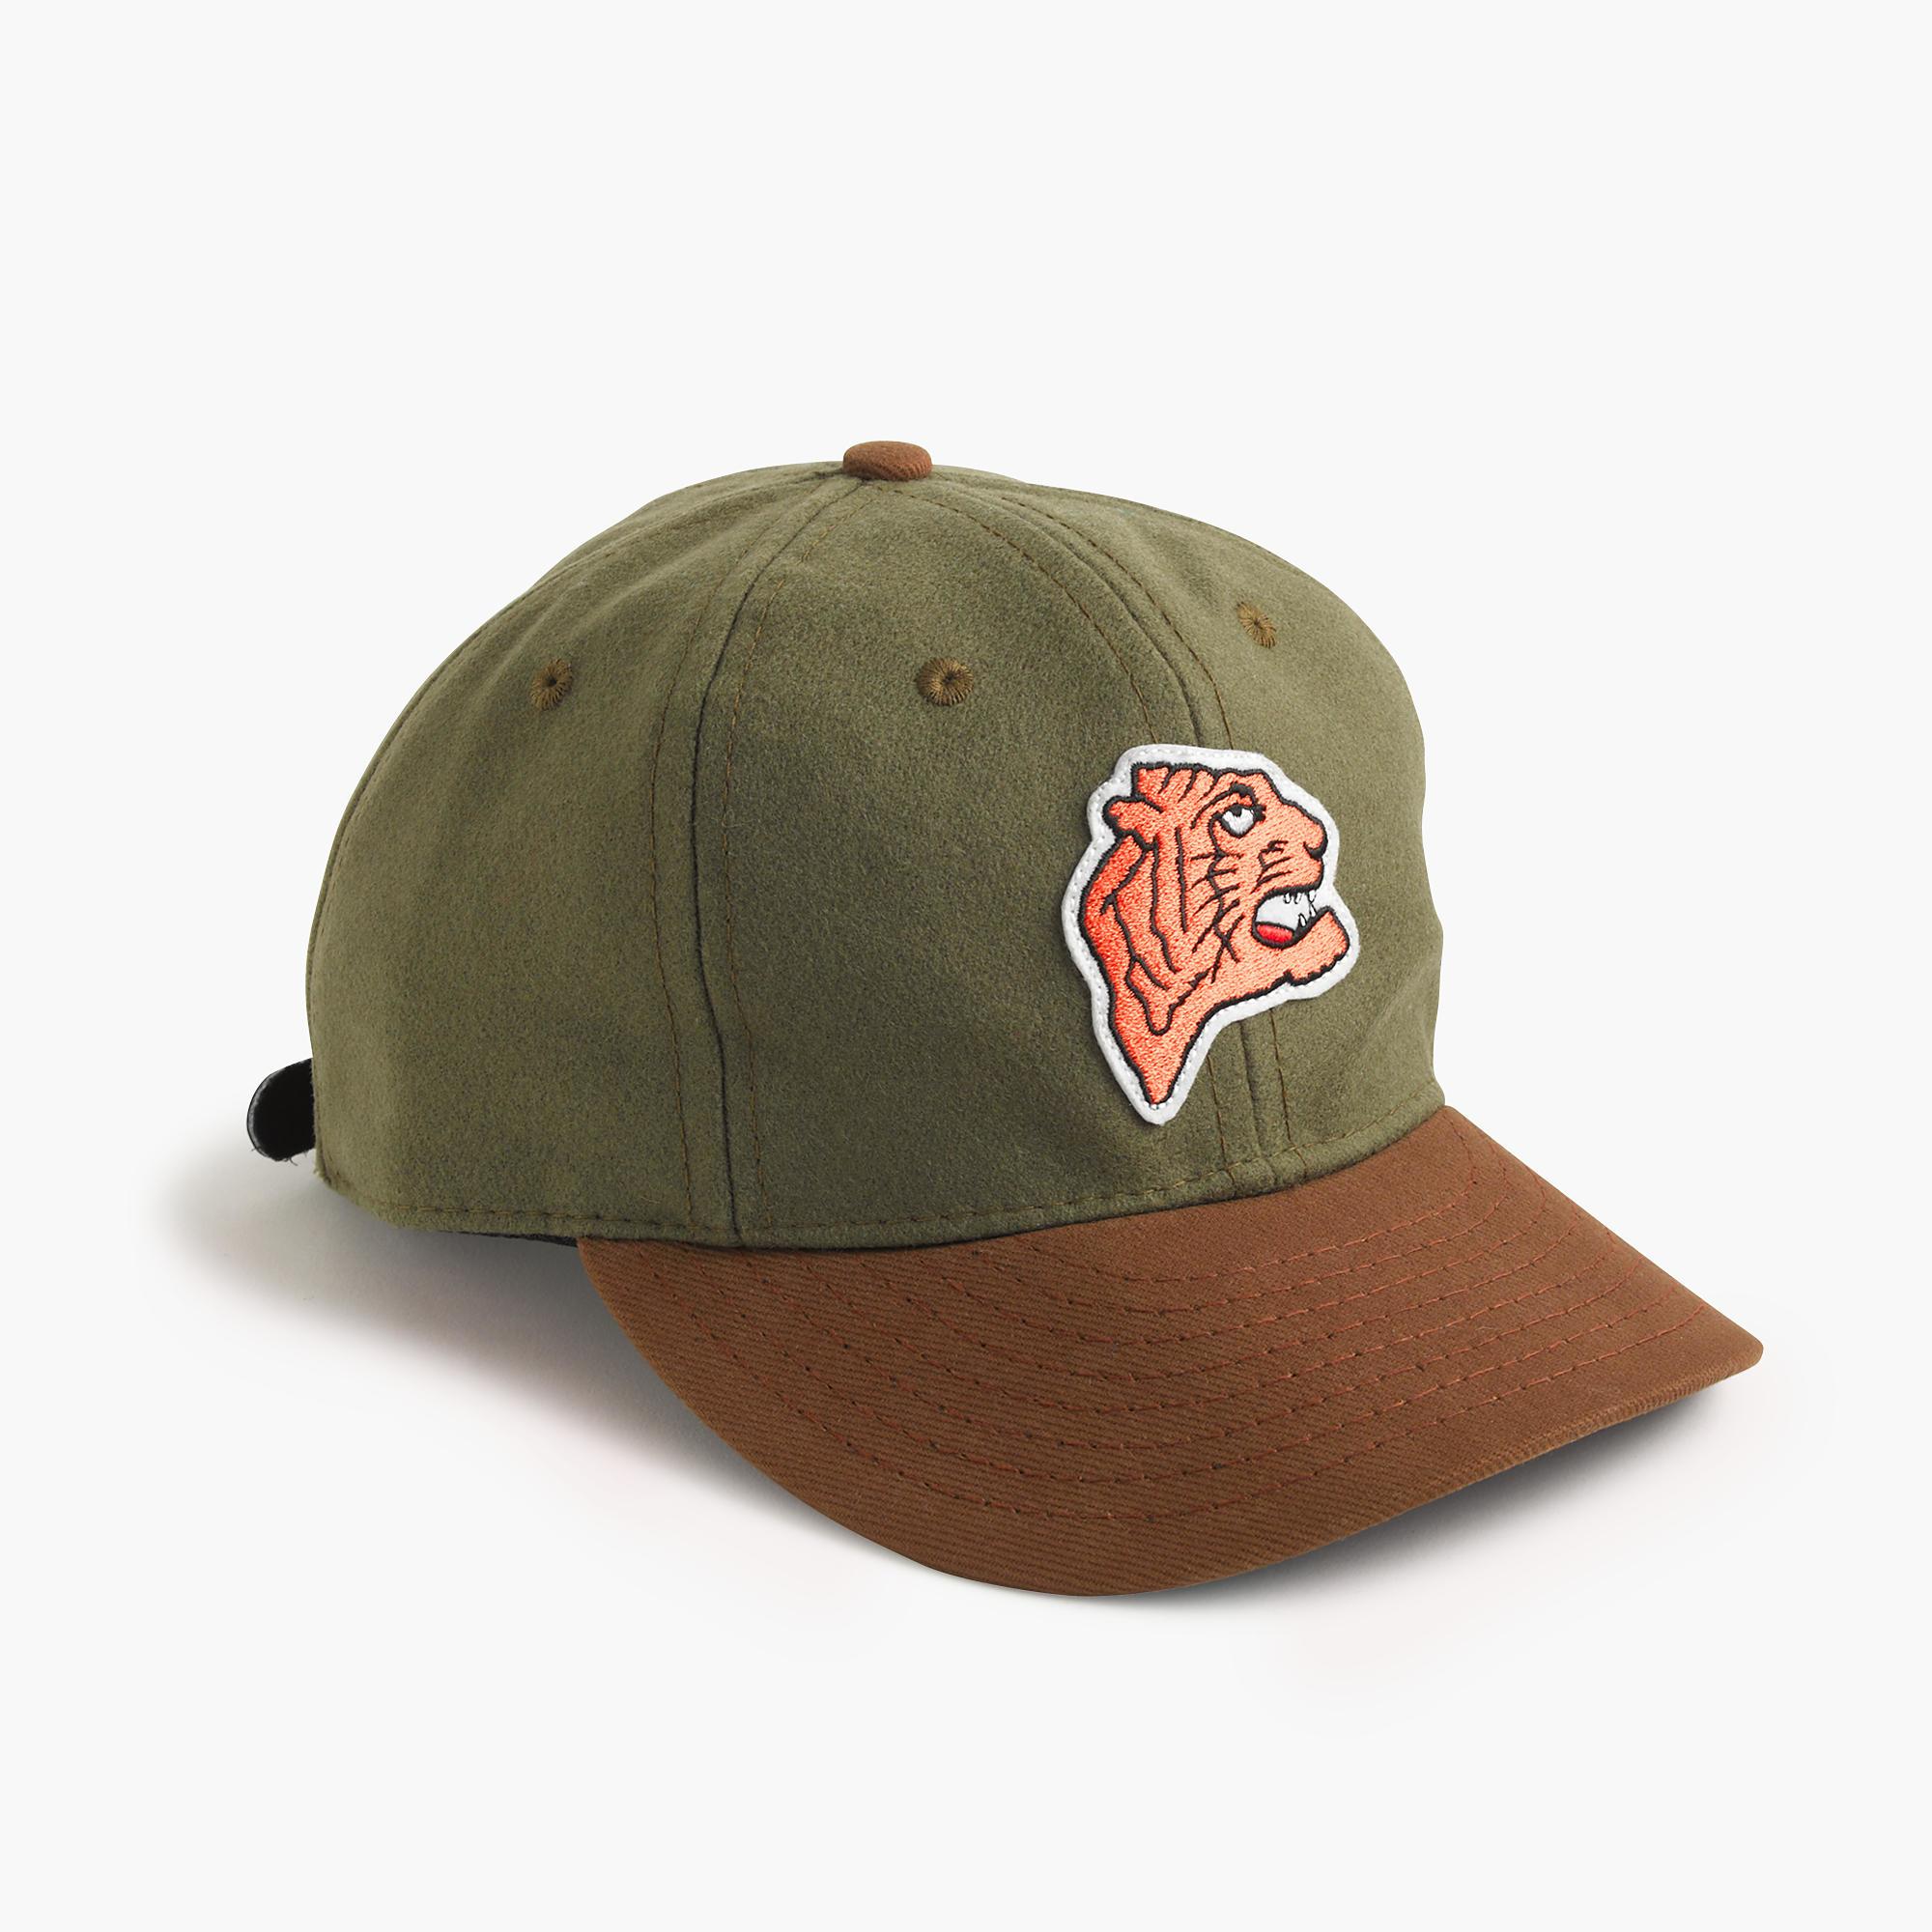 421c54c2a8 J.Crew Green Ebbets Field Flannels Marianao Tigres Indigo Ball Cap for men